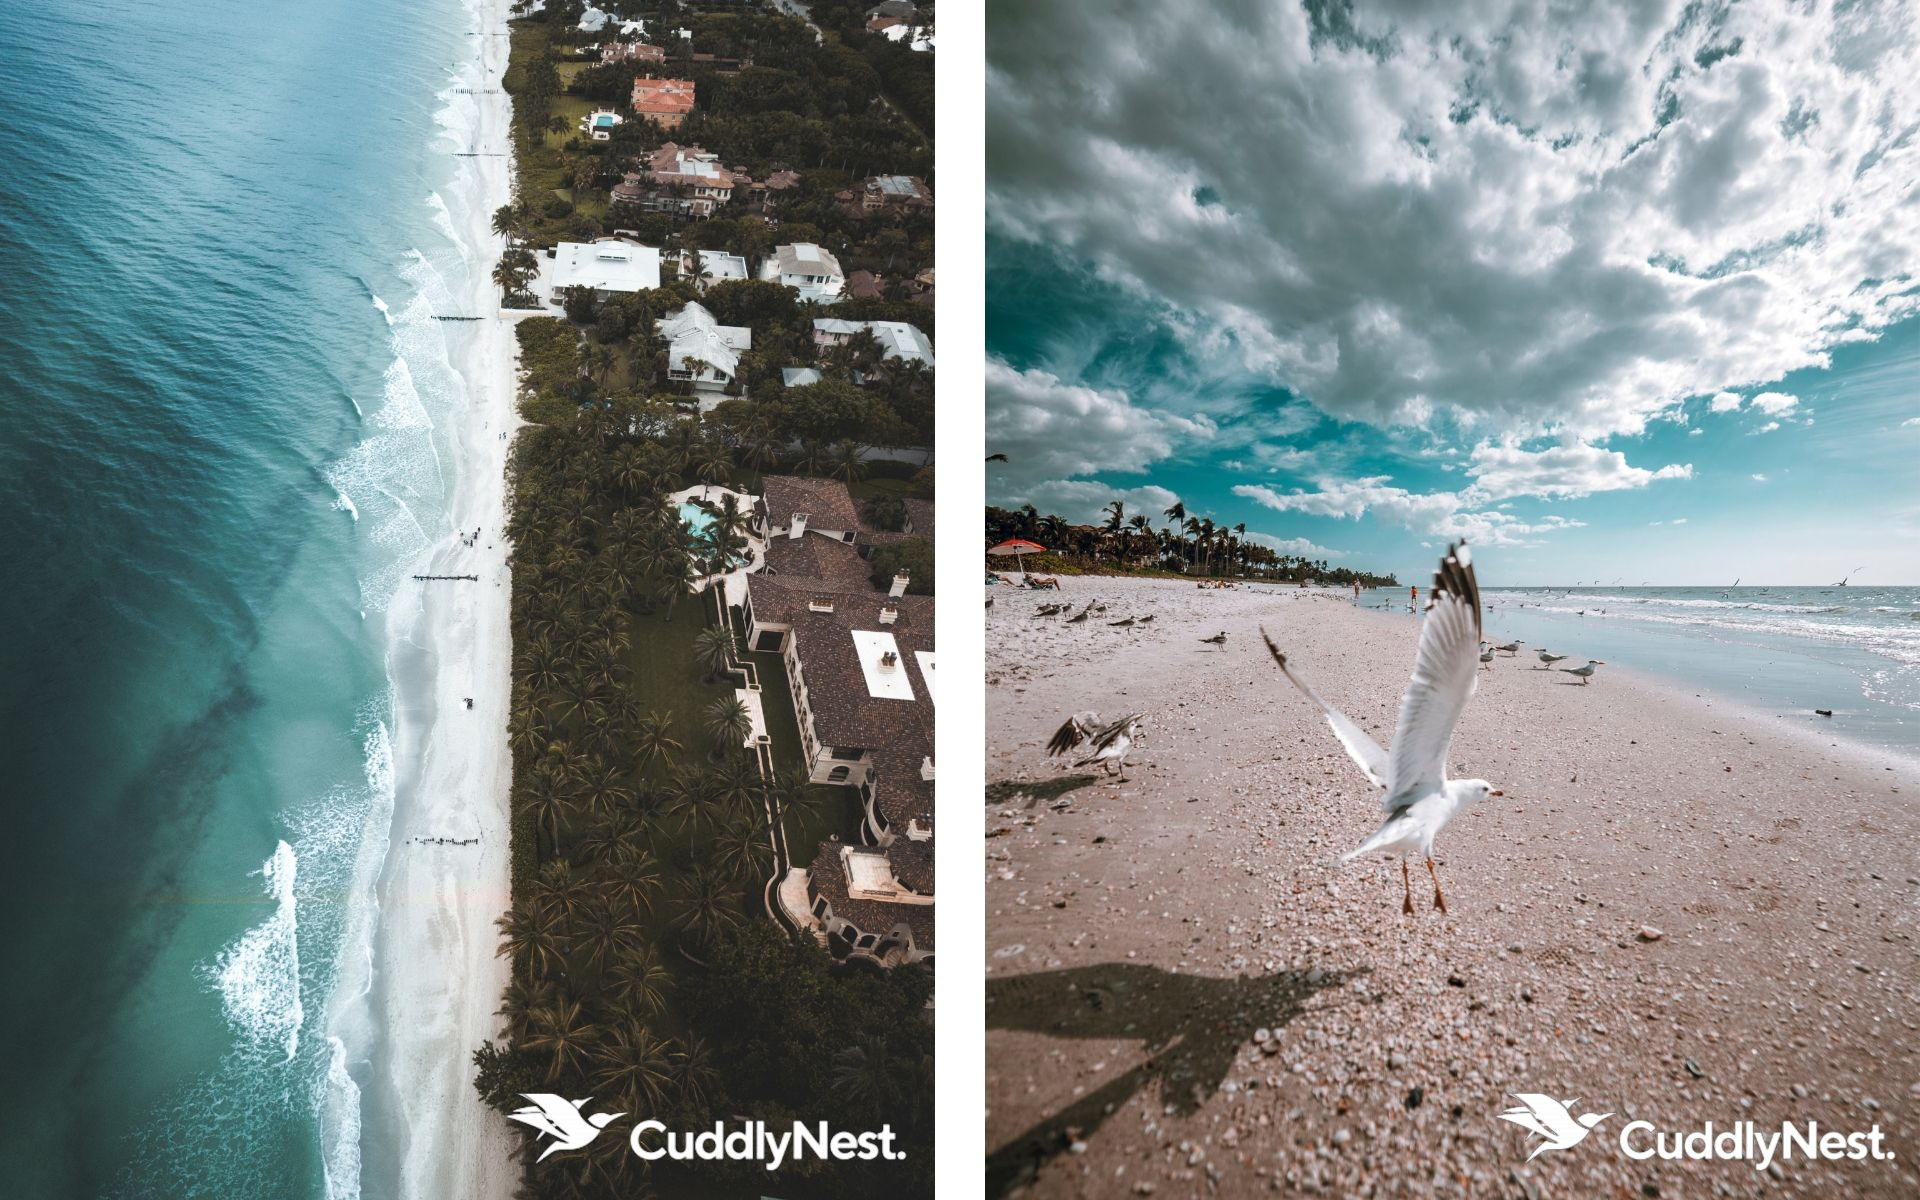 Naples Florida Vaction Homes CuddlyNest Beach Houses Holidays Rentals Condos